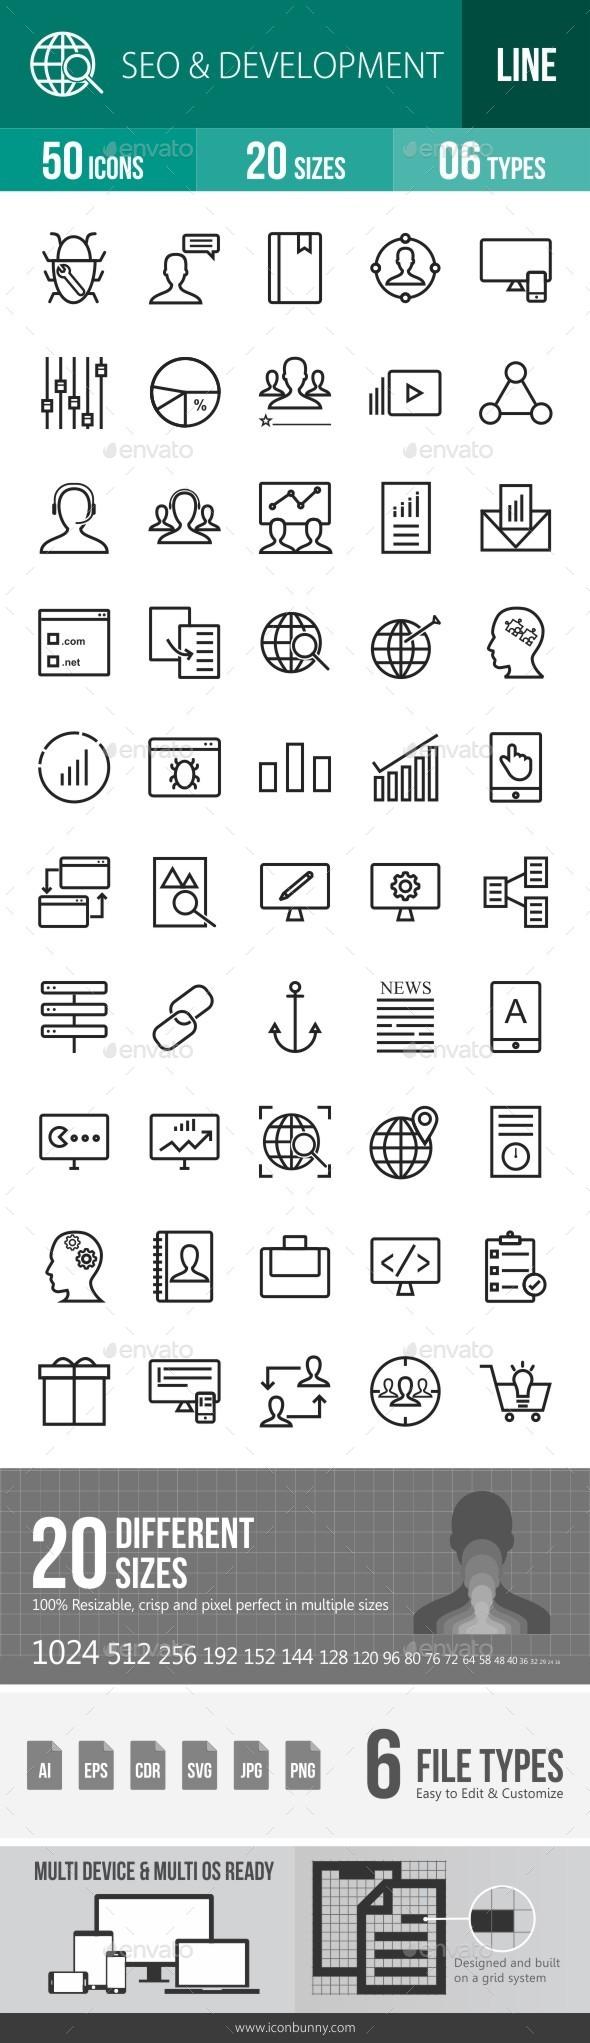 SEO & Development Services Line Icons - Icons